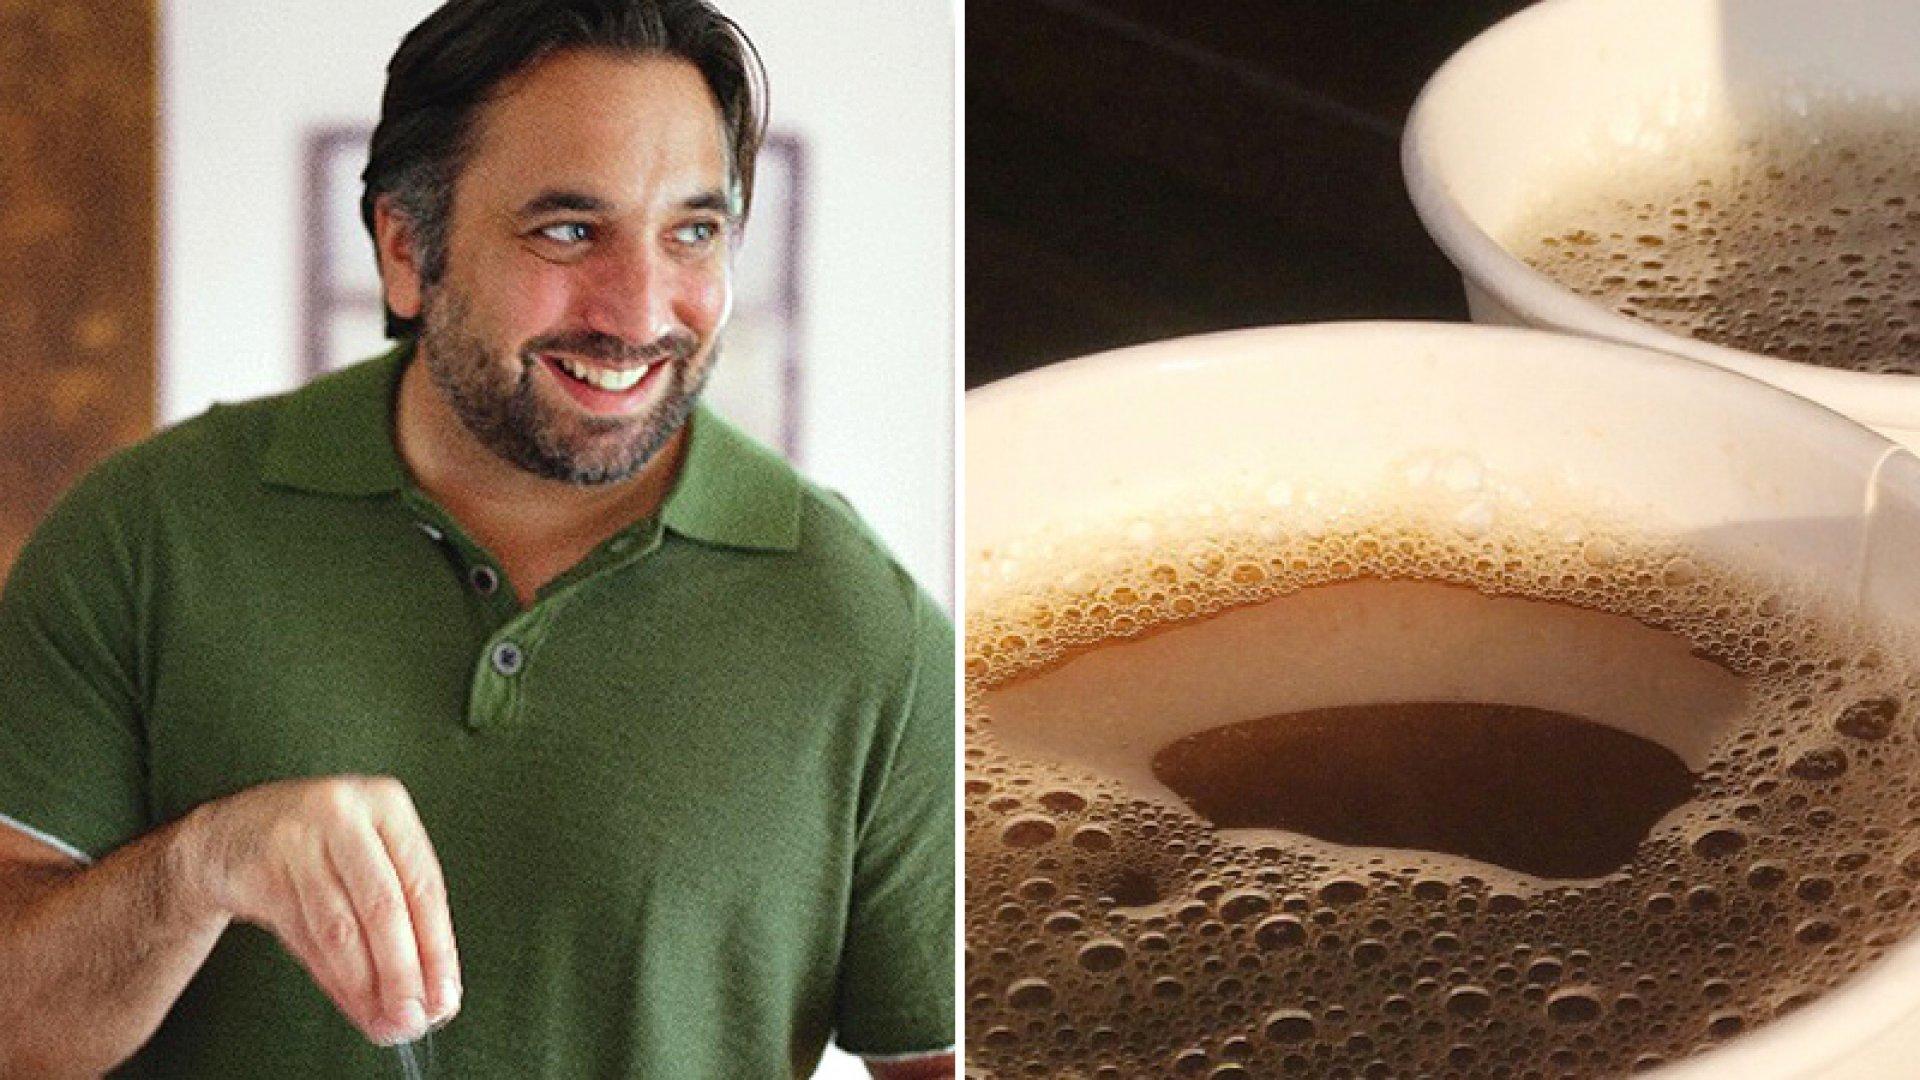 This Entrepreneur Wants to Make Bone Broth the Next Juice